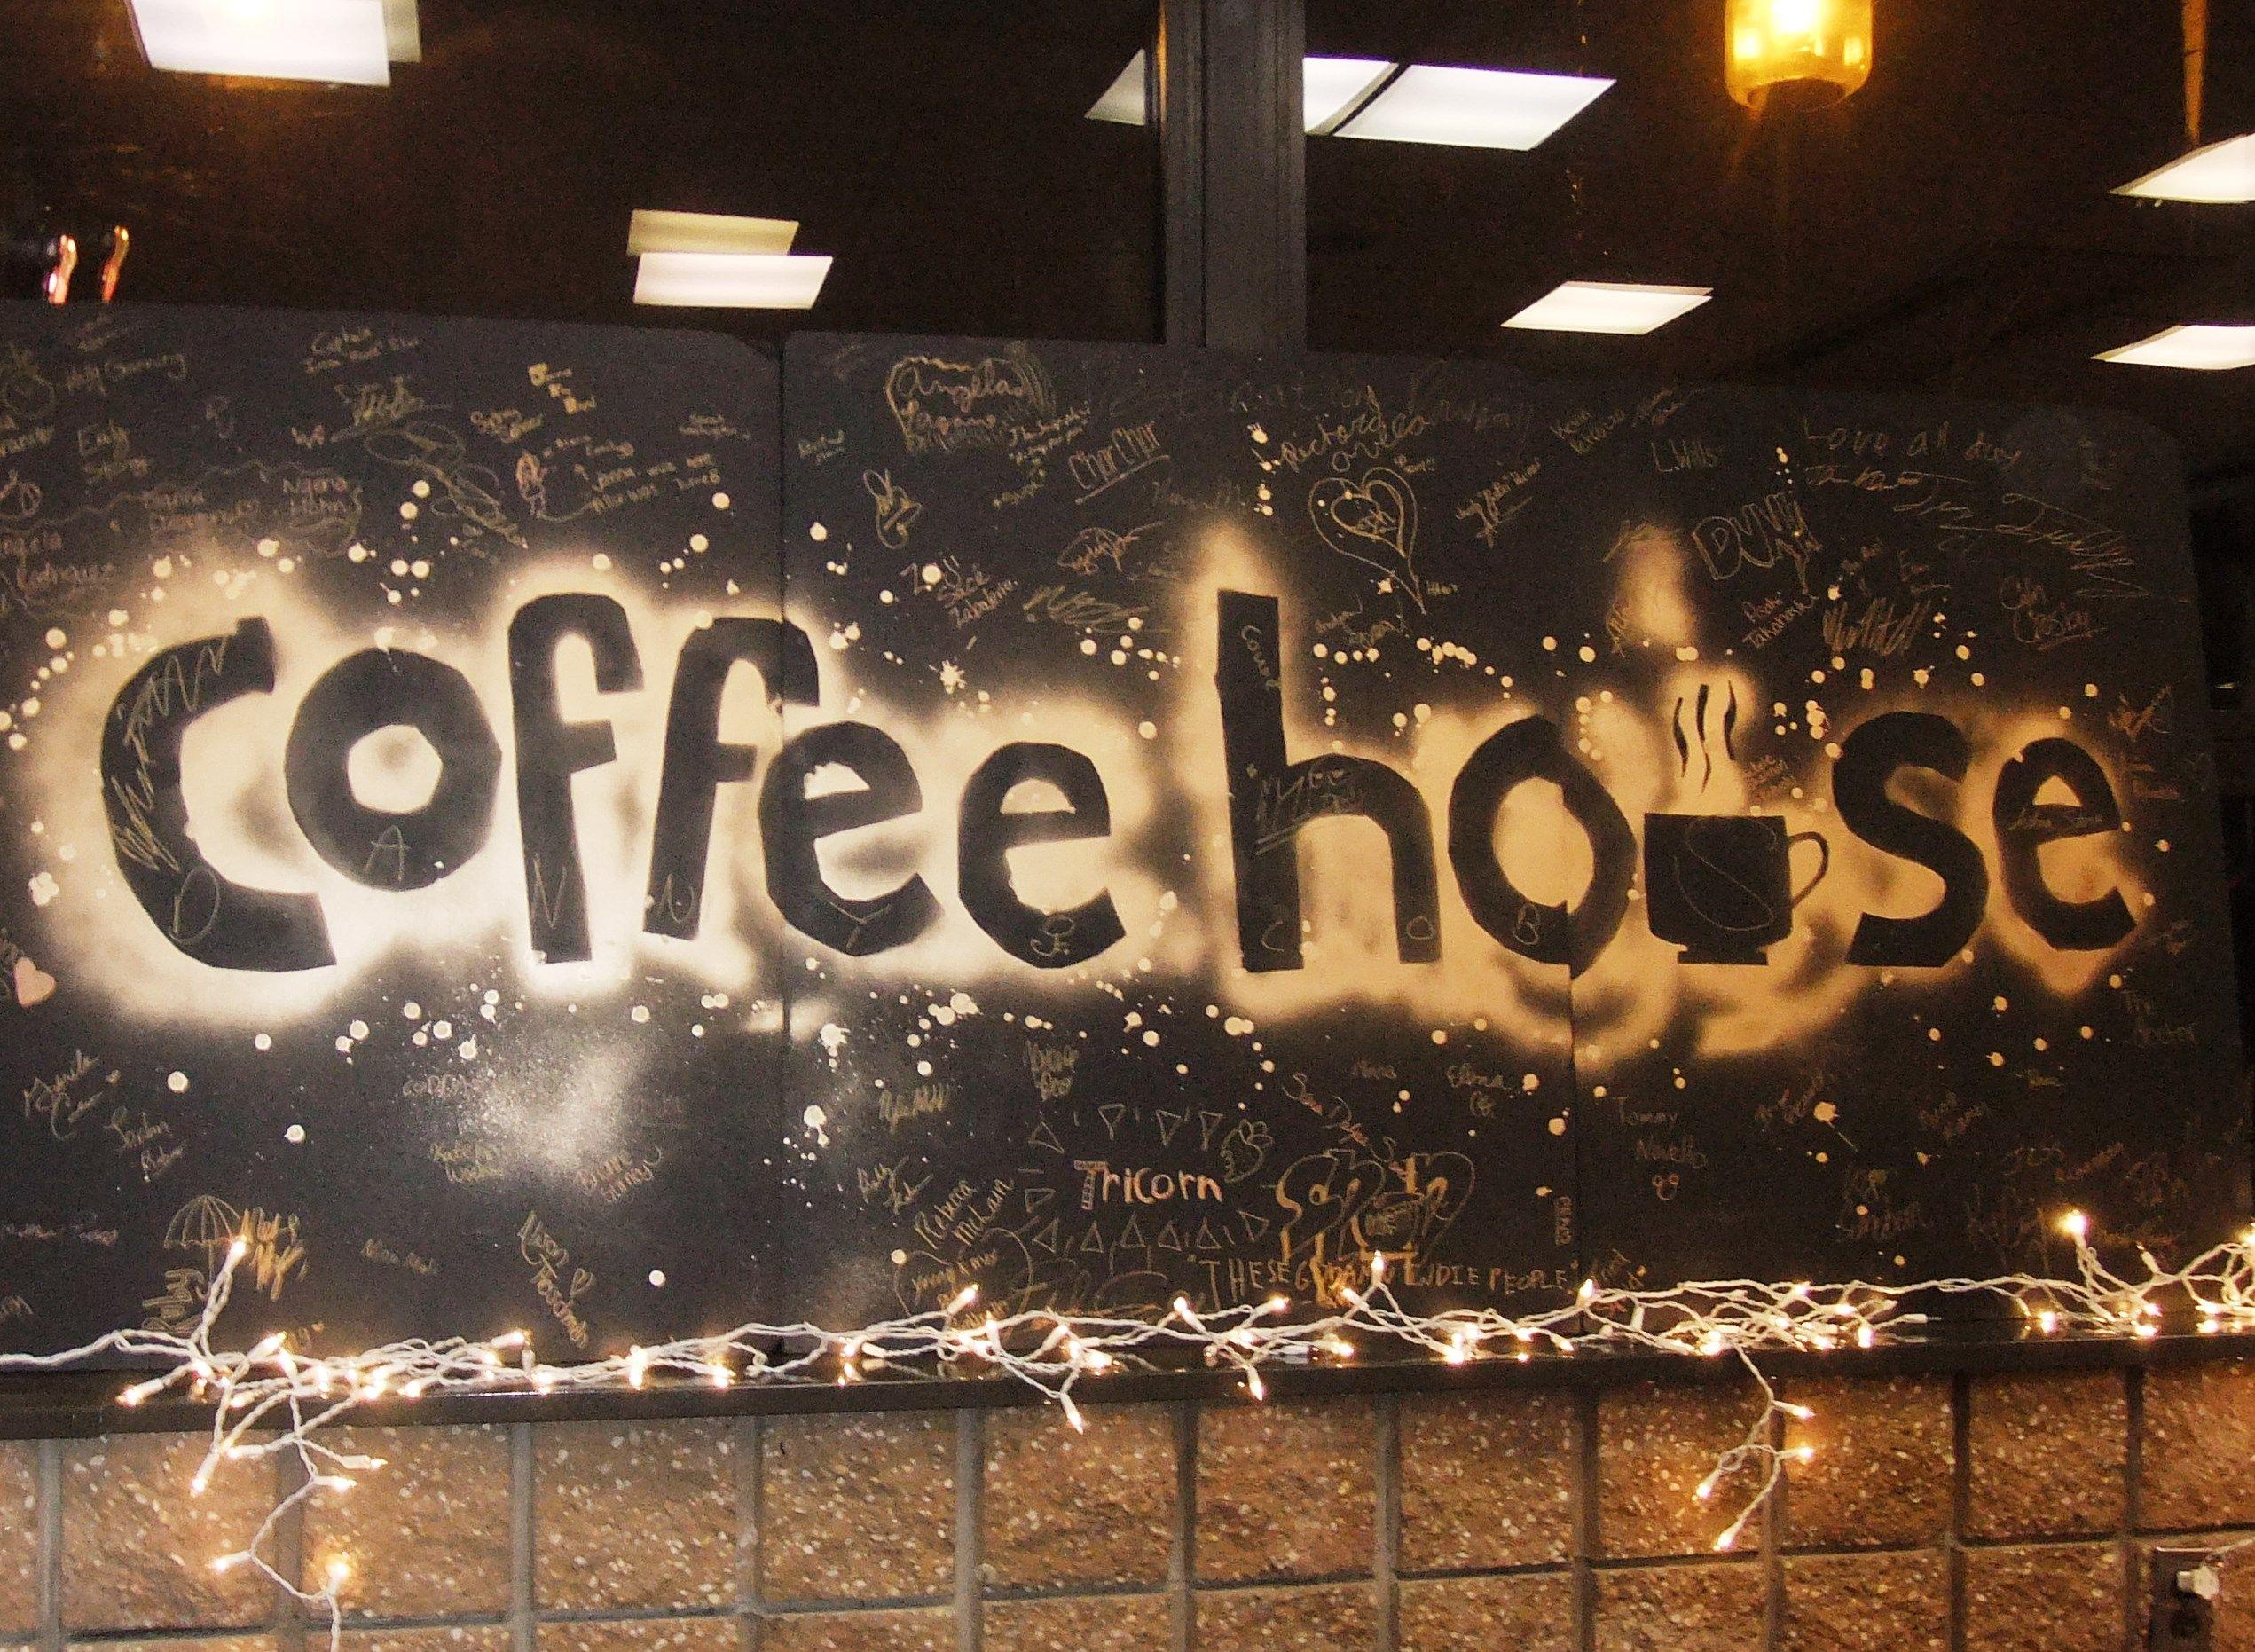 coffee house images Google Search Coffee house, Coffee